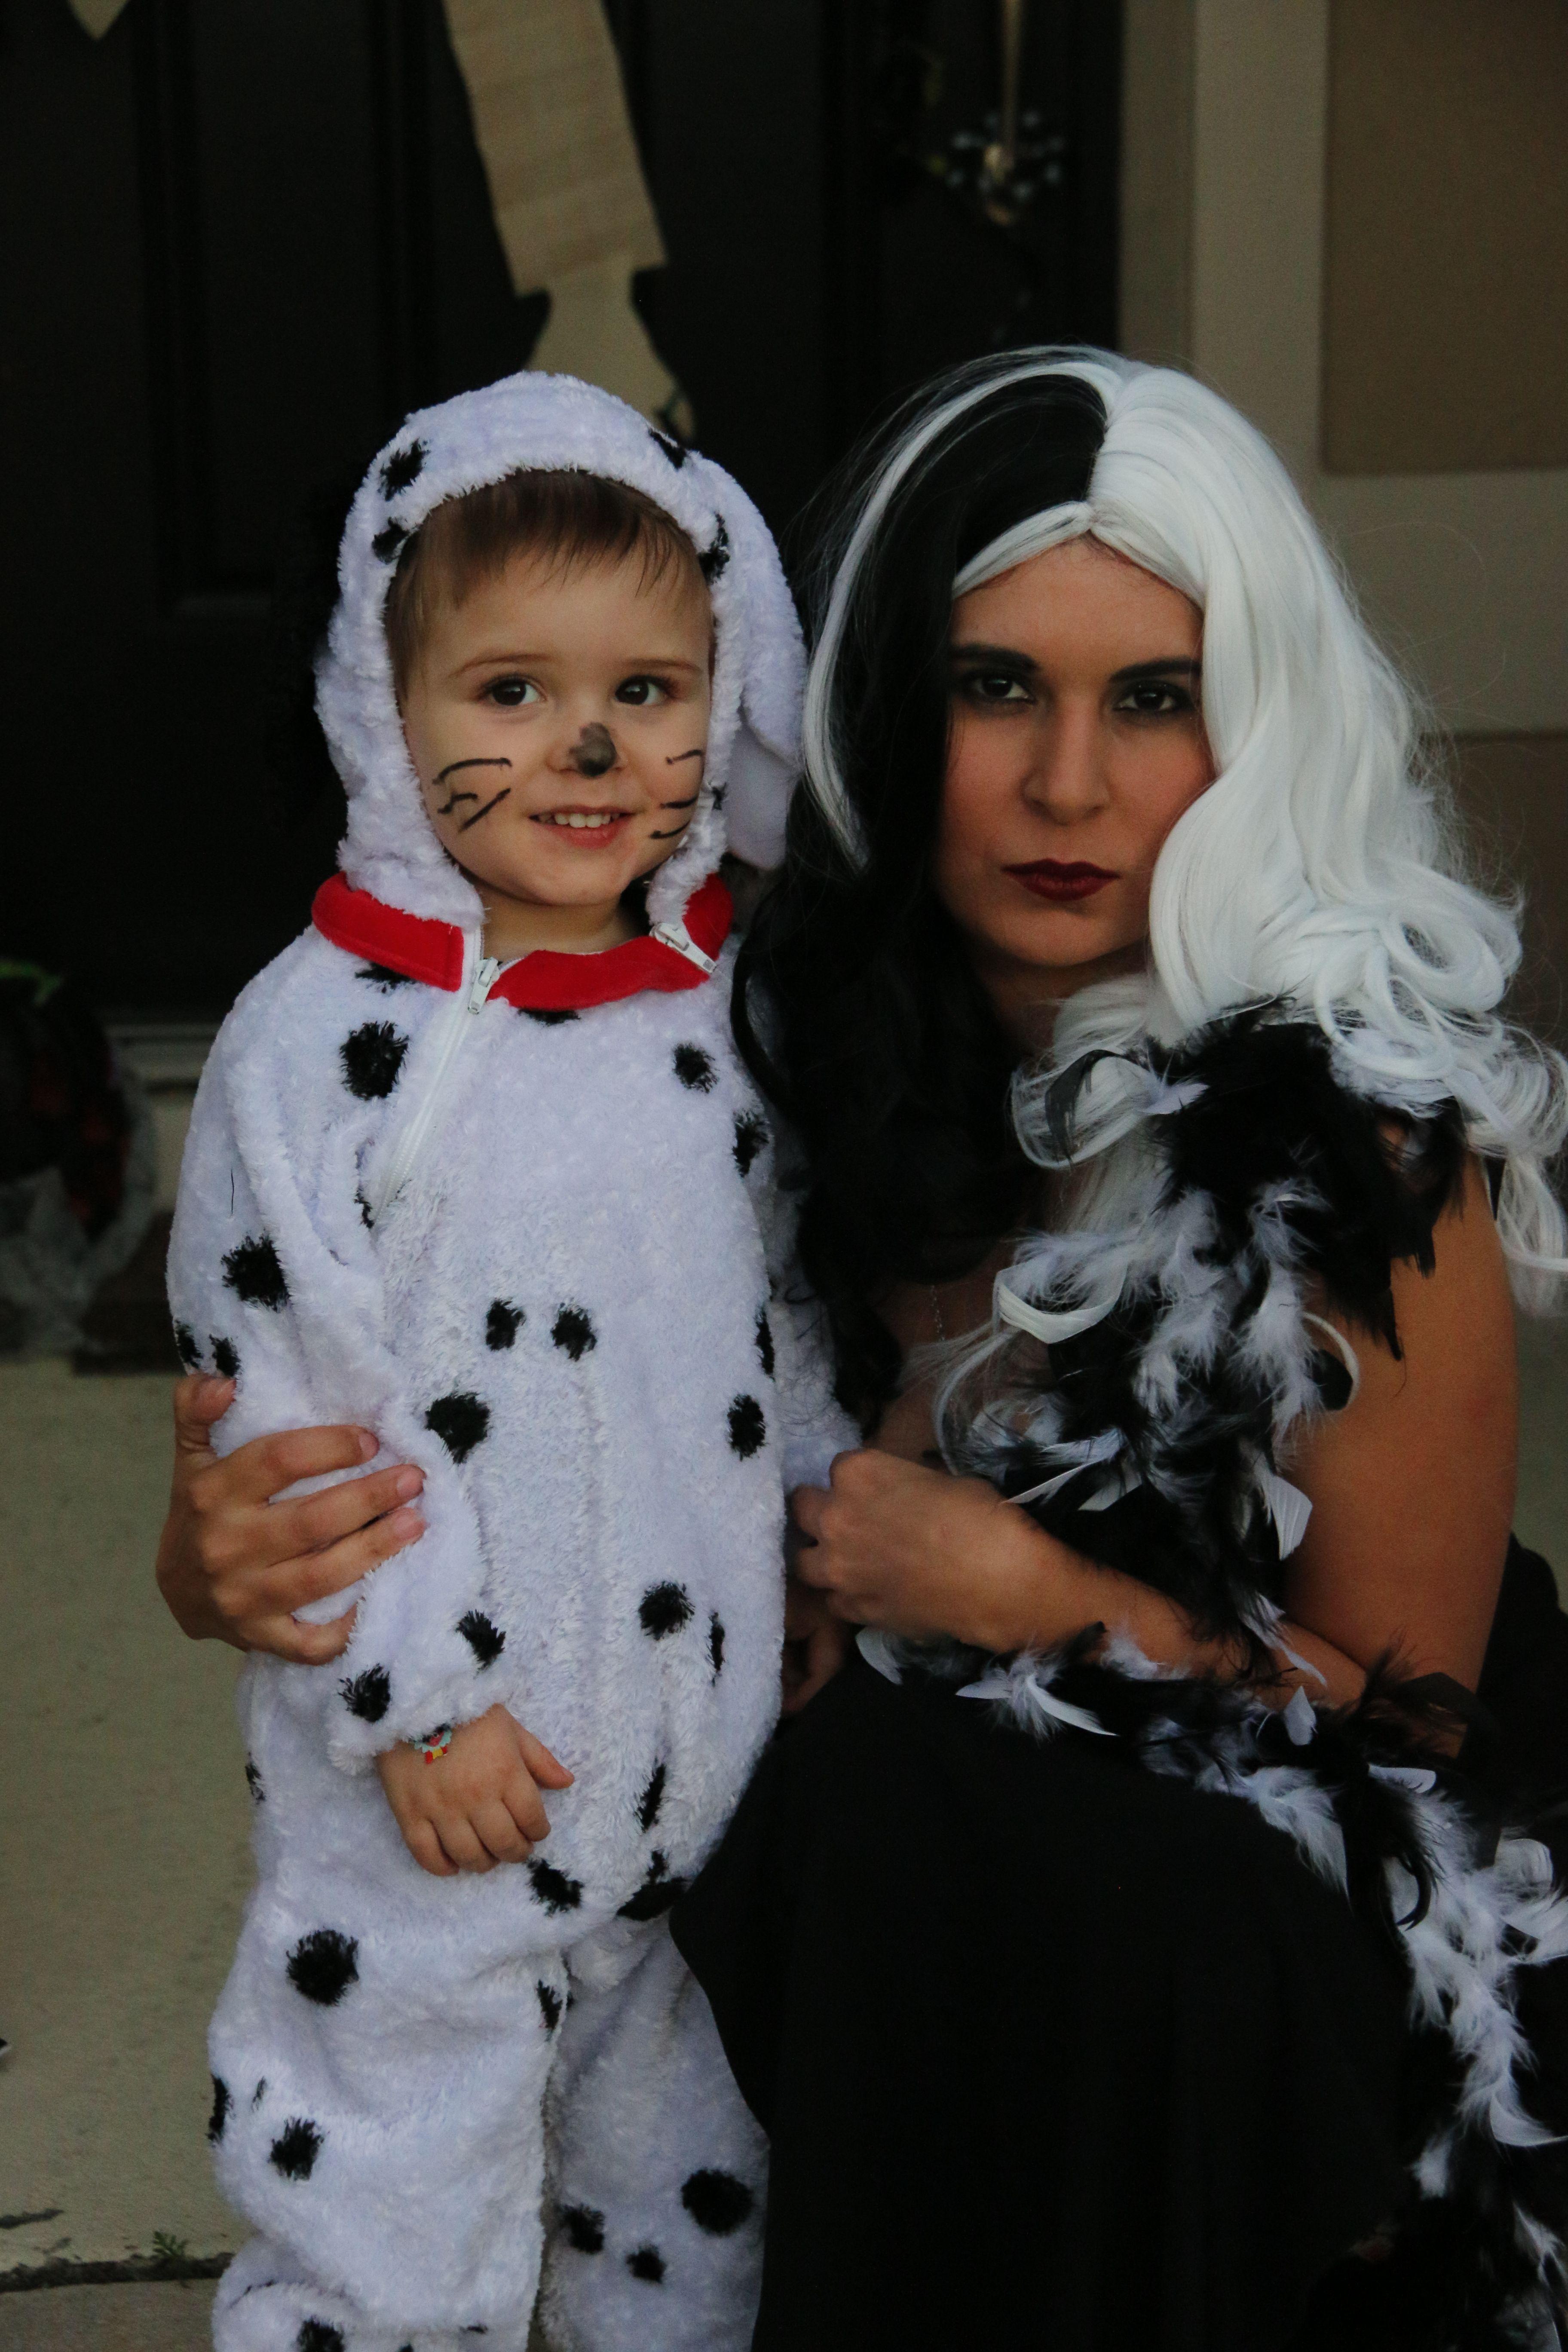 Disfraz Aladin Babies Amp Daddies T Halloween Costumes